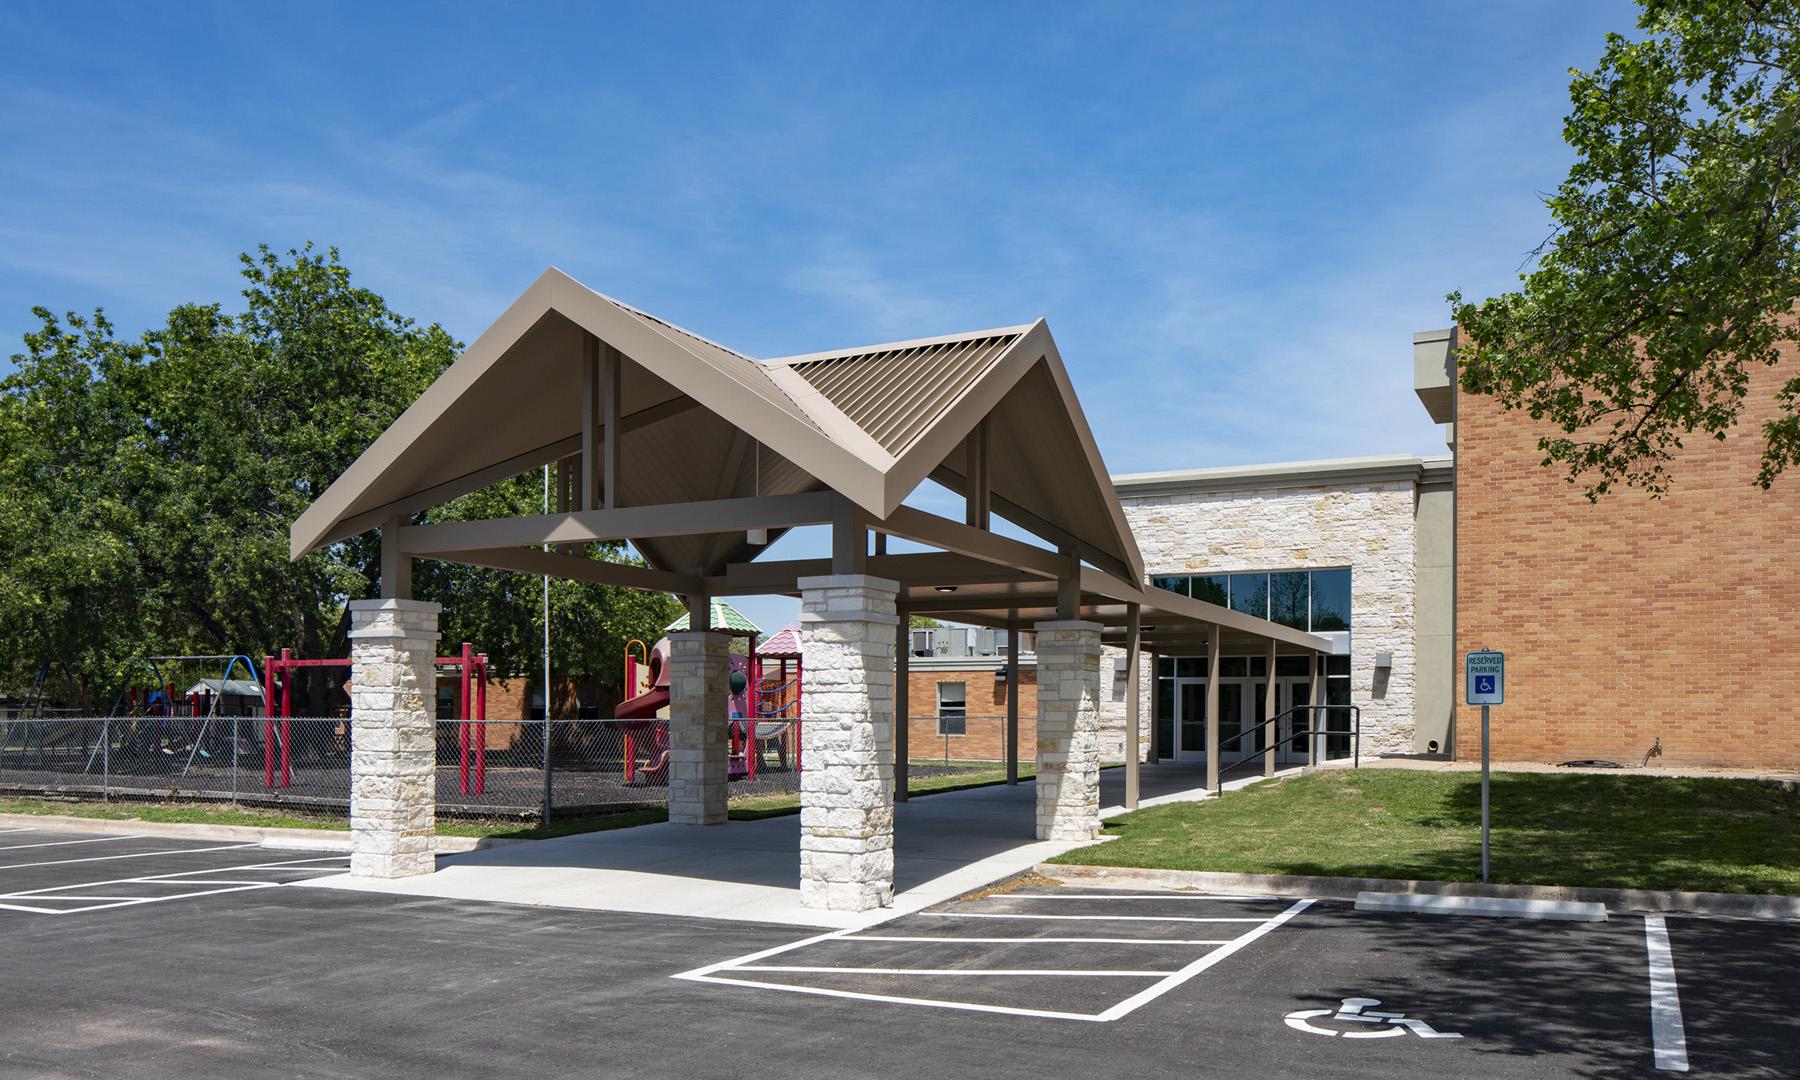 Woodlawn Baptist Church Canopy Drop-Off, Austin, TX, Heimsath Architects Church Design Specialists